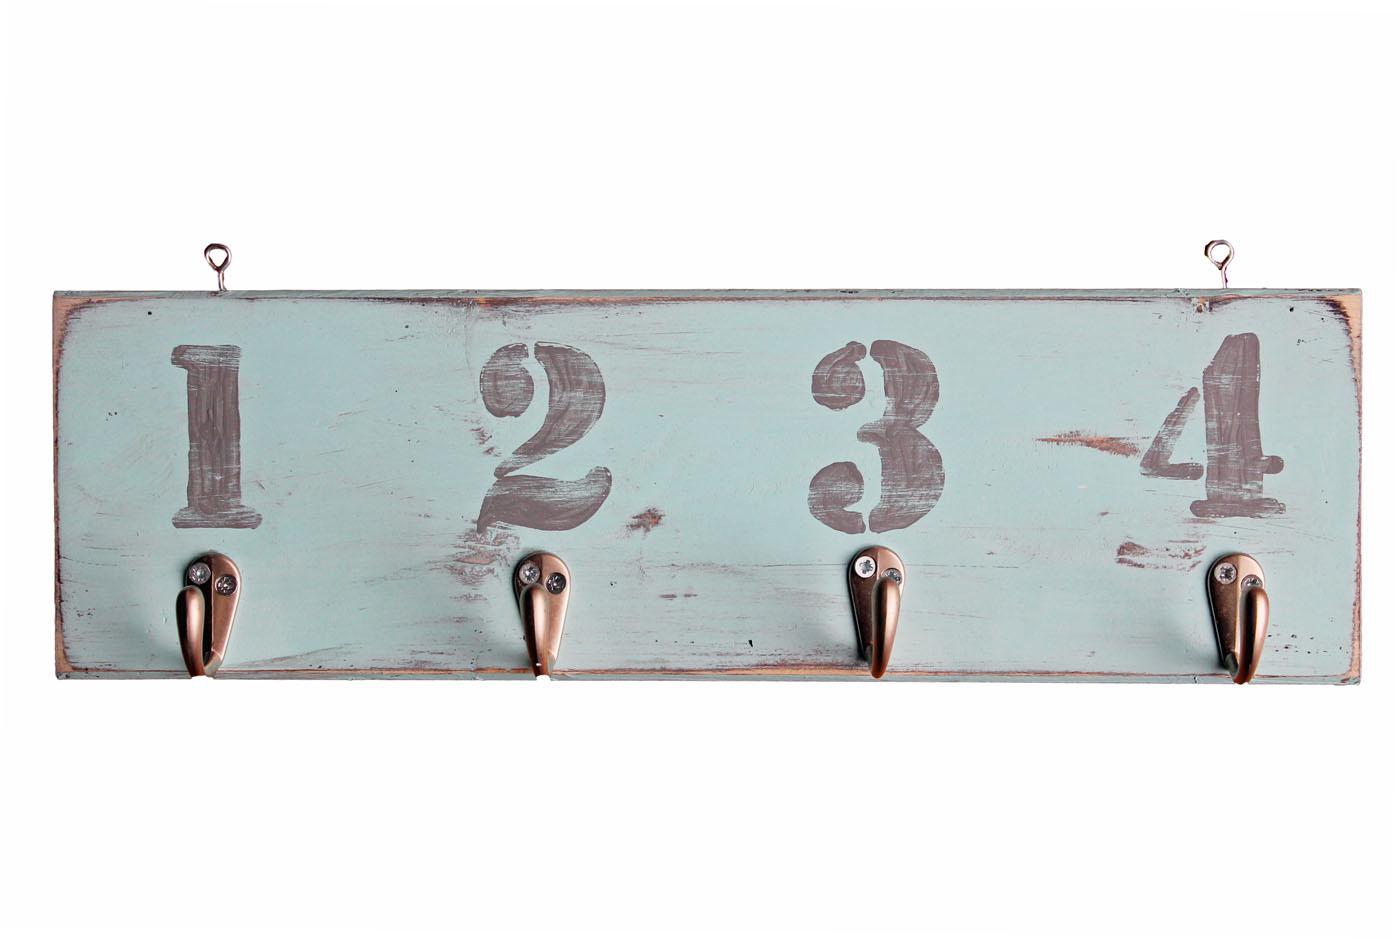 lillis handcraft holzschilder garderobe hakenleise im. Black Bedroom Furniture Sets. Home Design Ideas